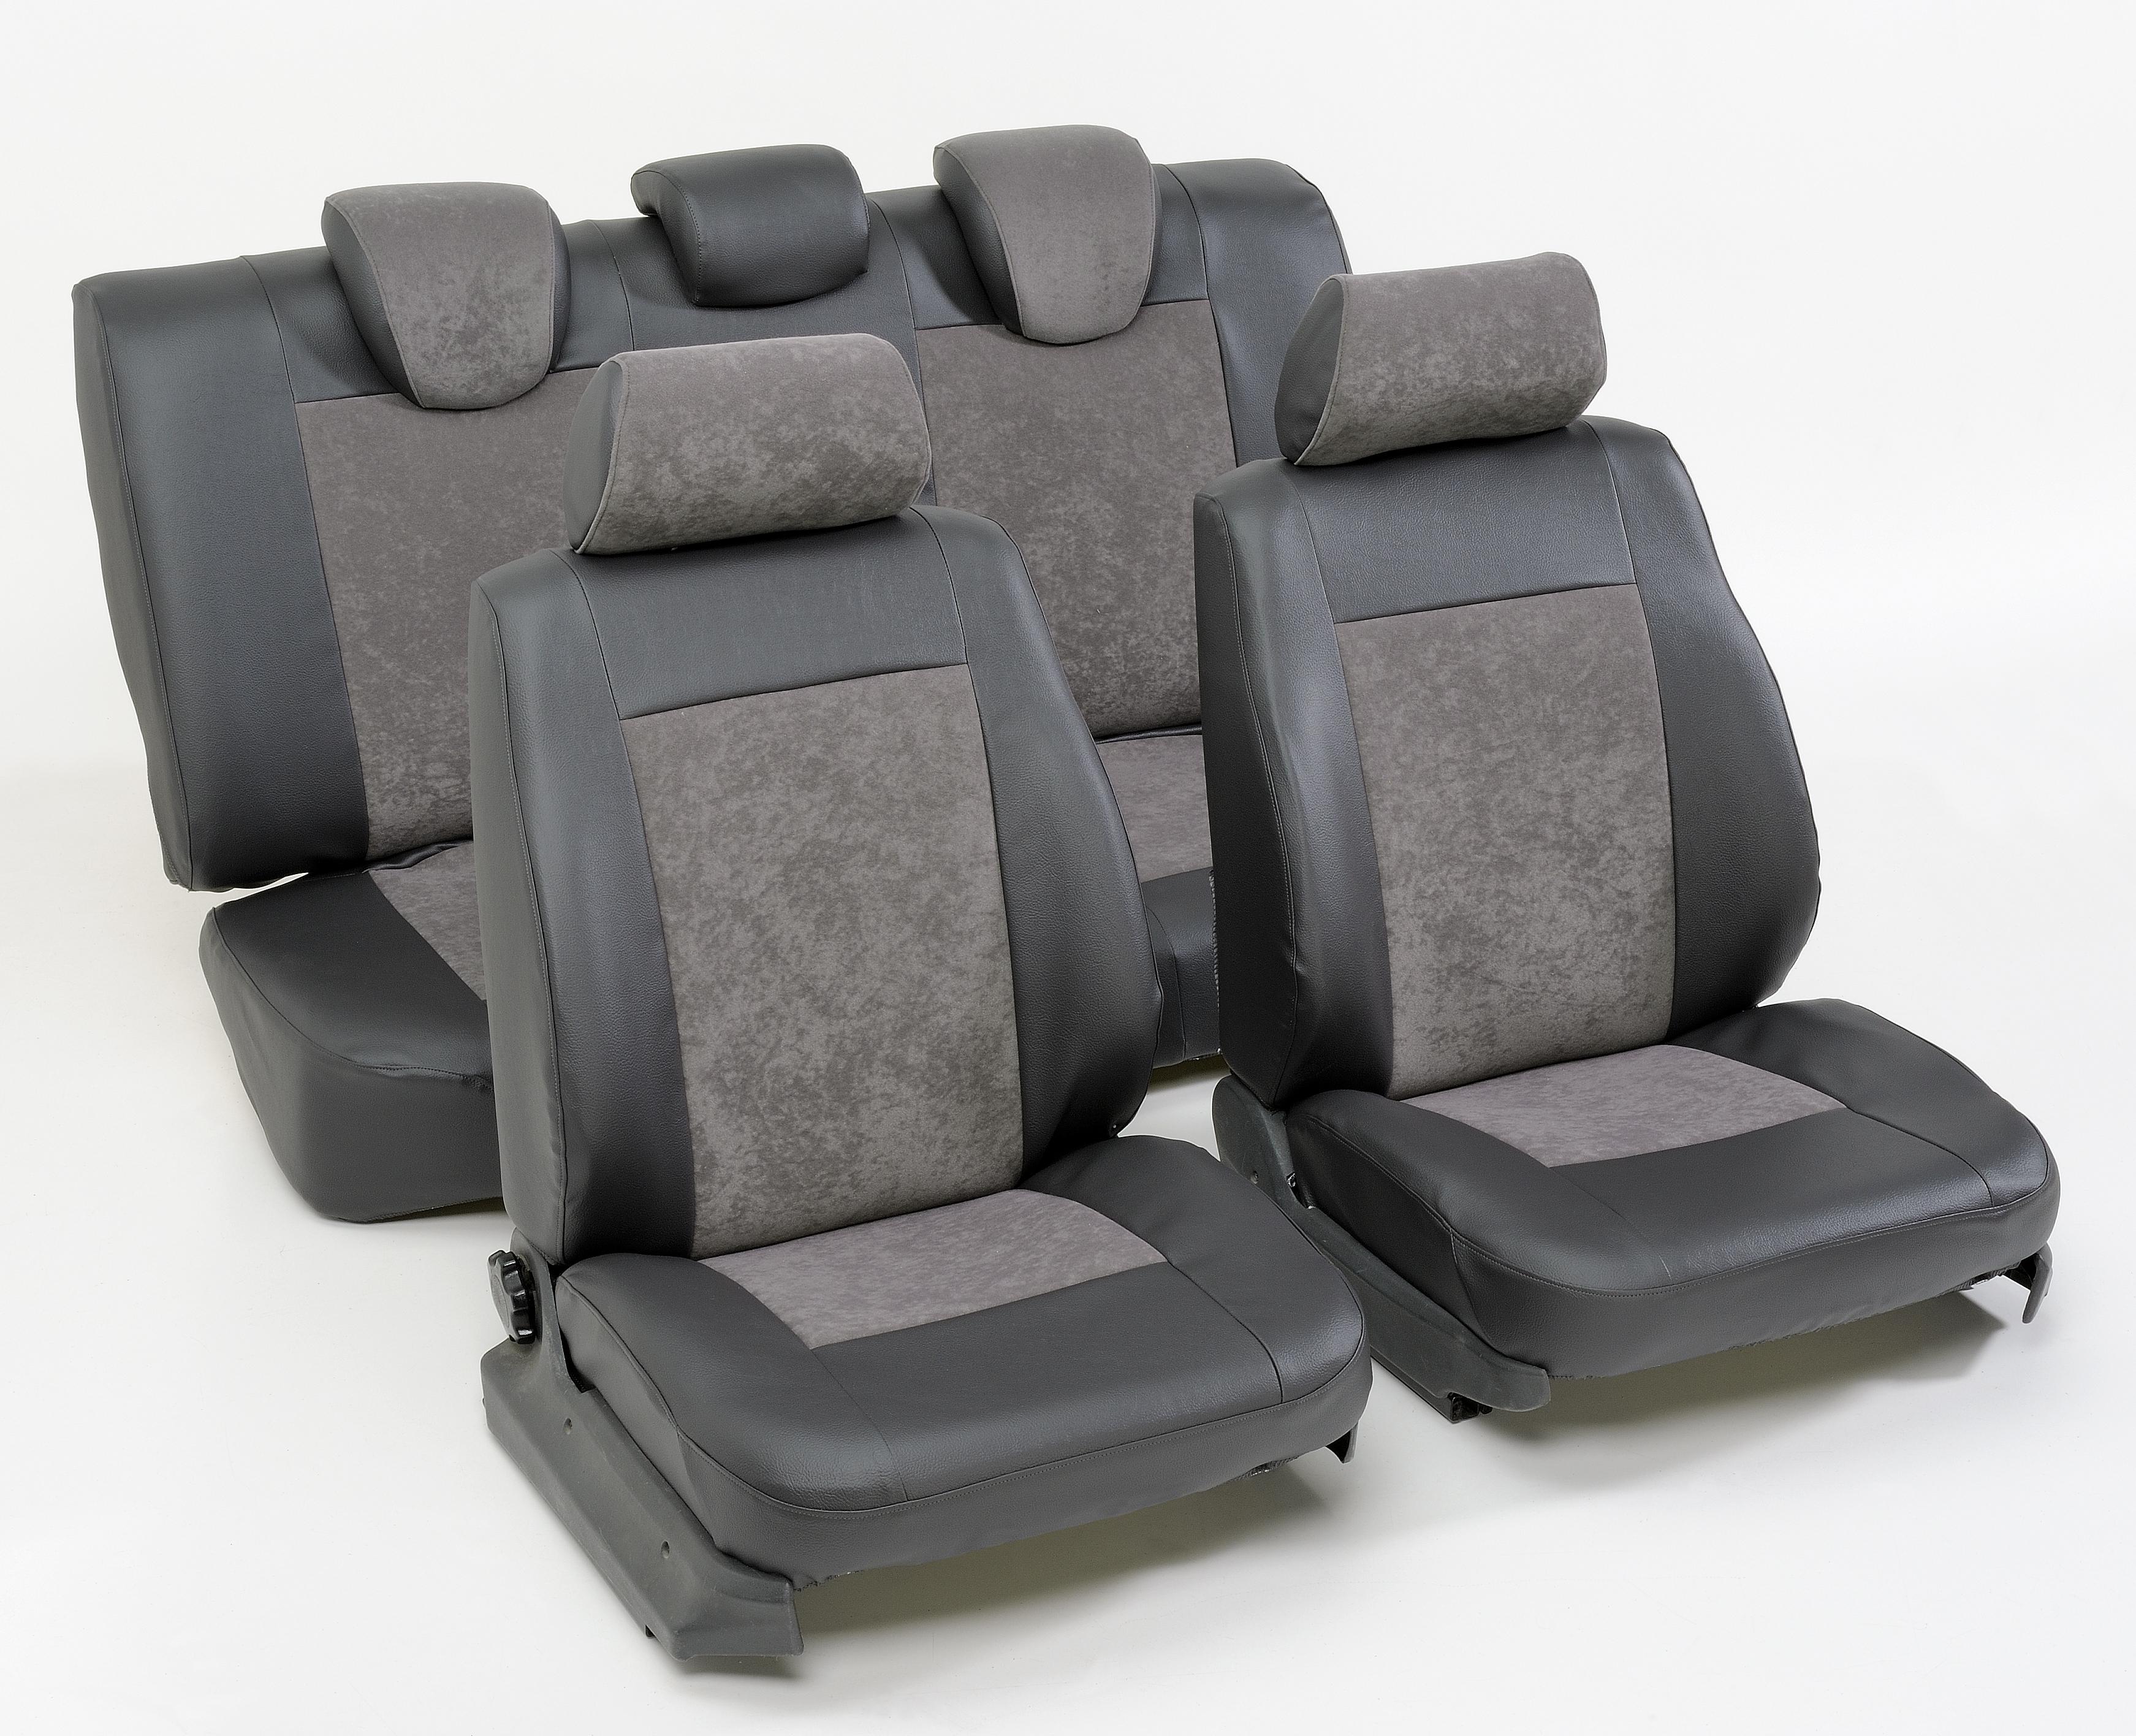 Elige las fundas para tu coche consejos norauto for Housse canape sur mesure